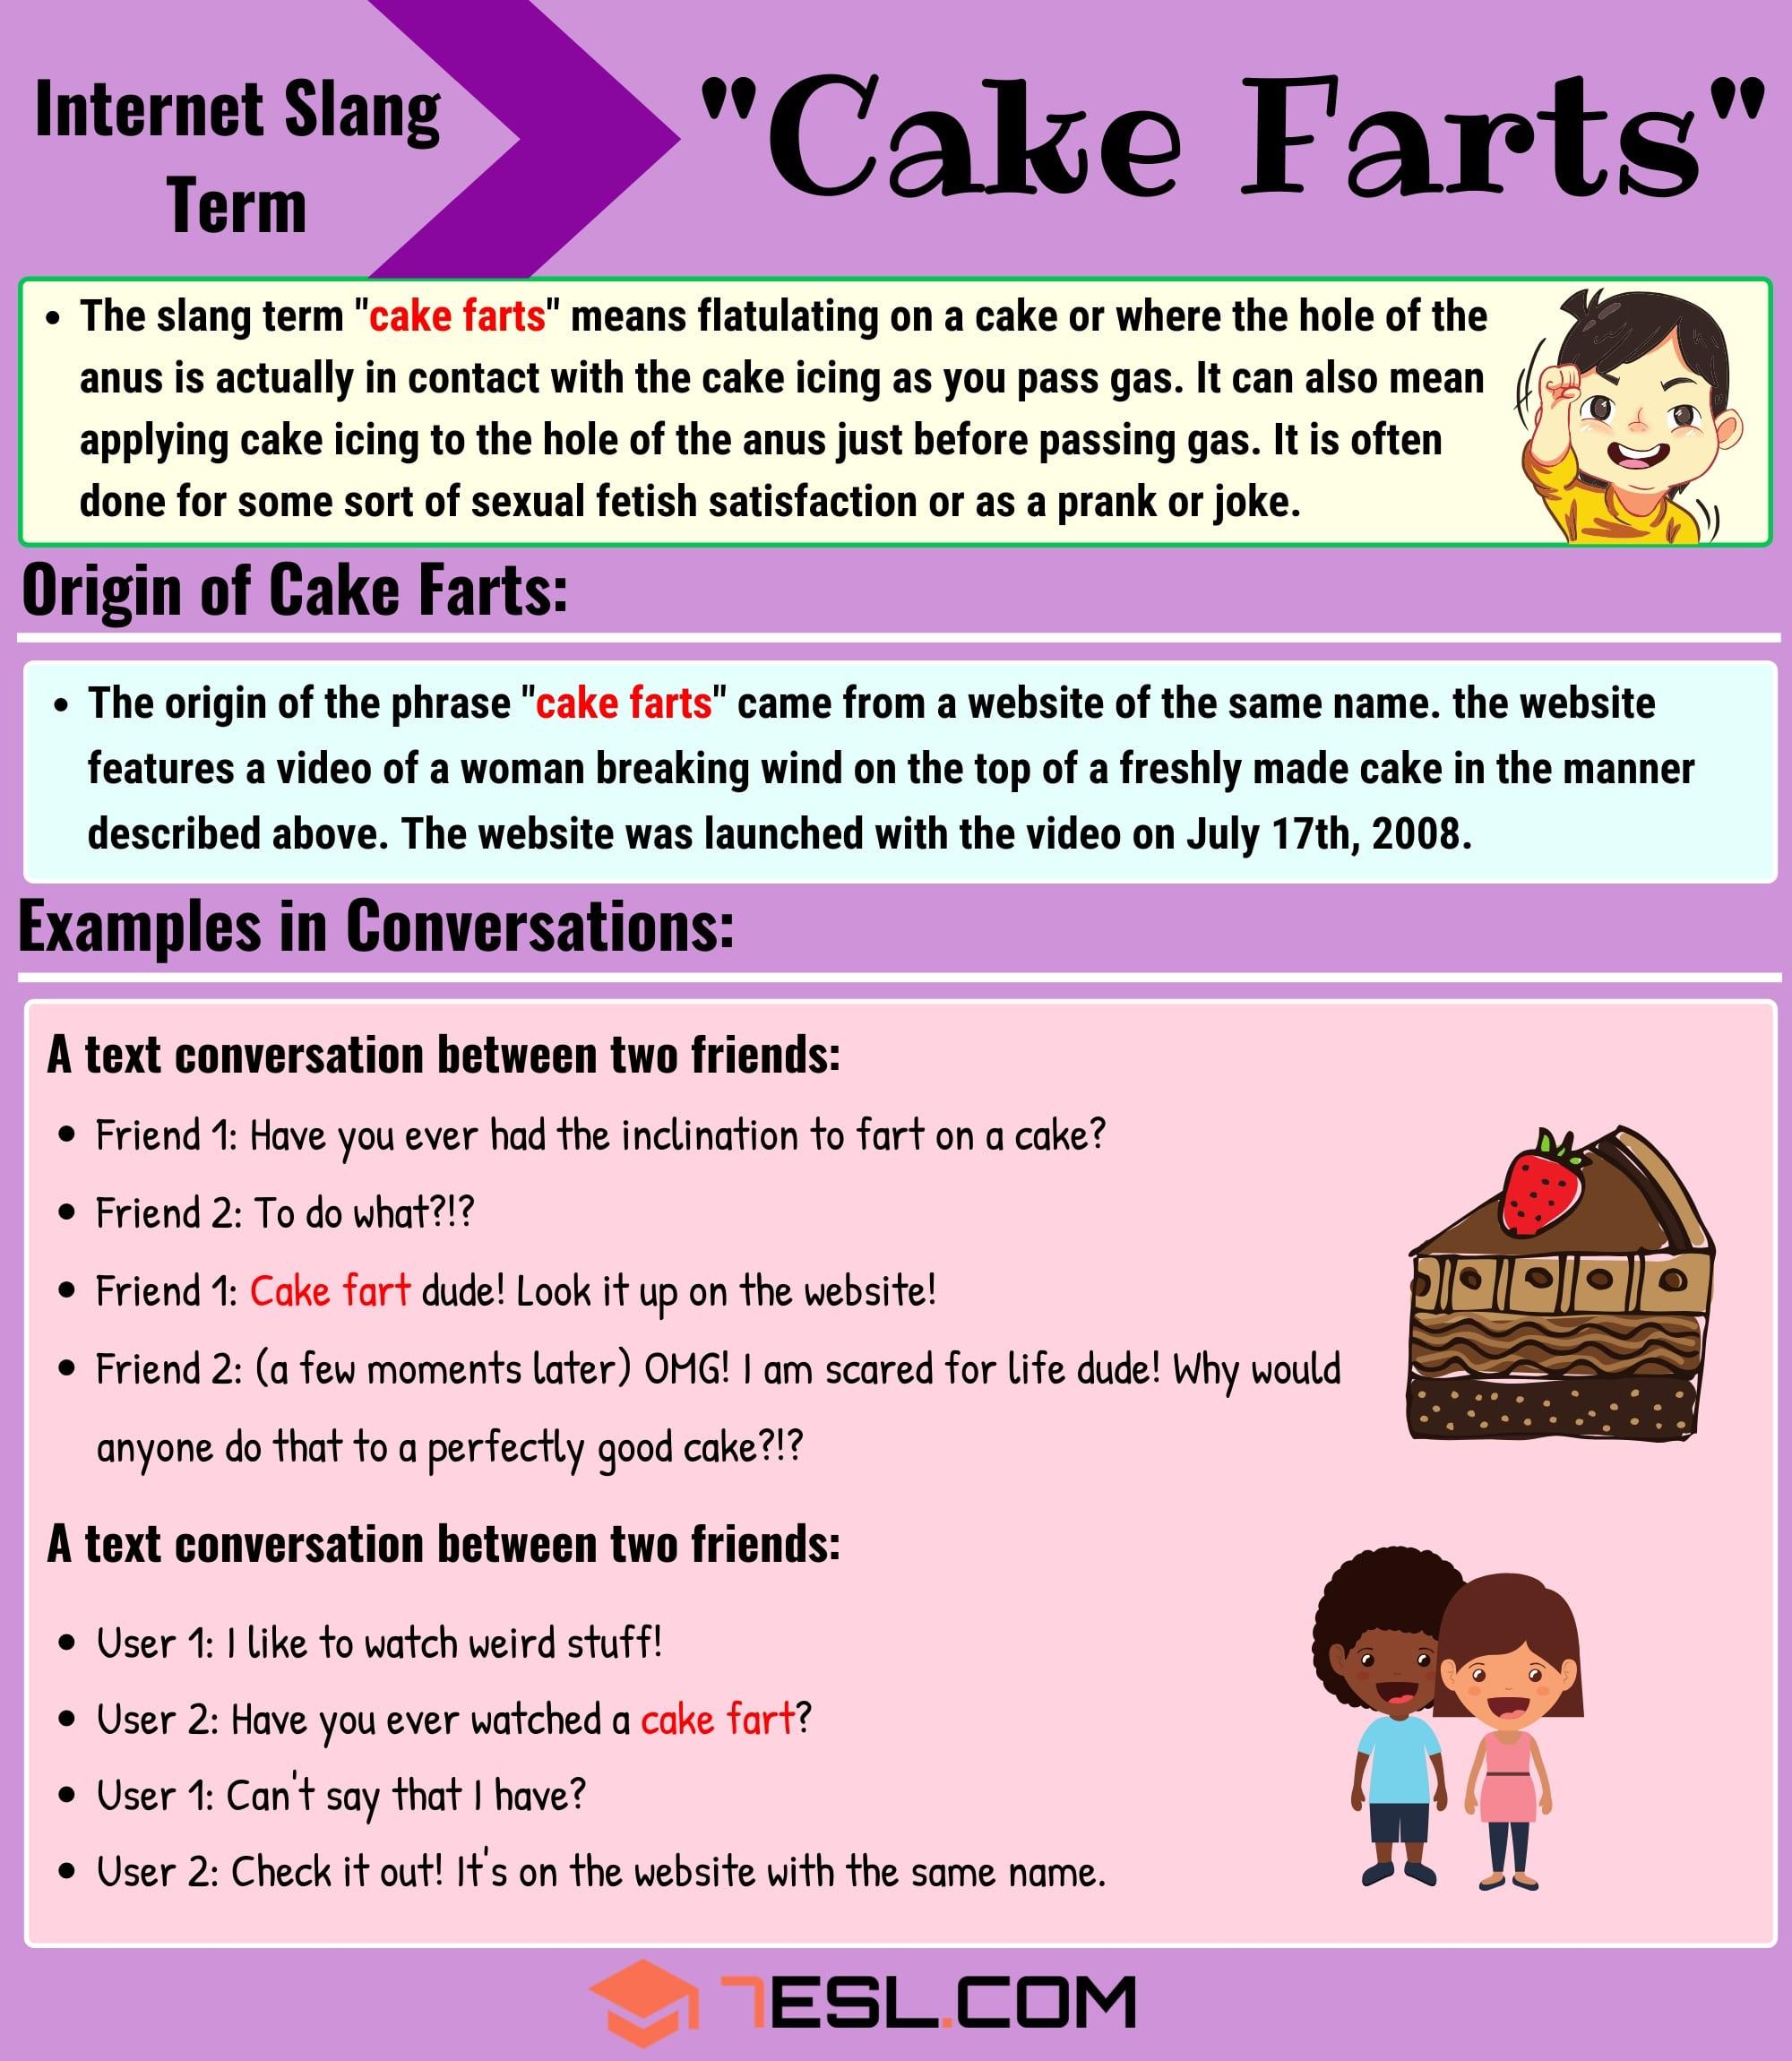 Cake Farts